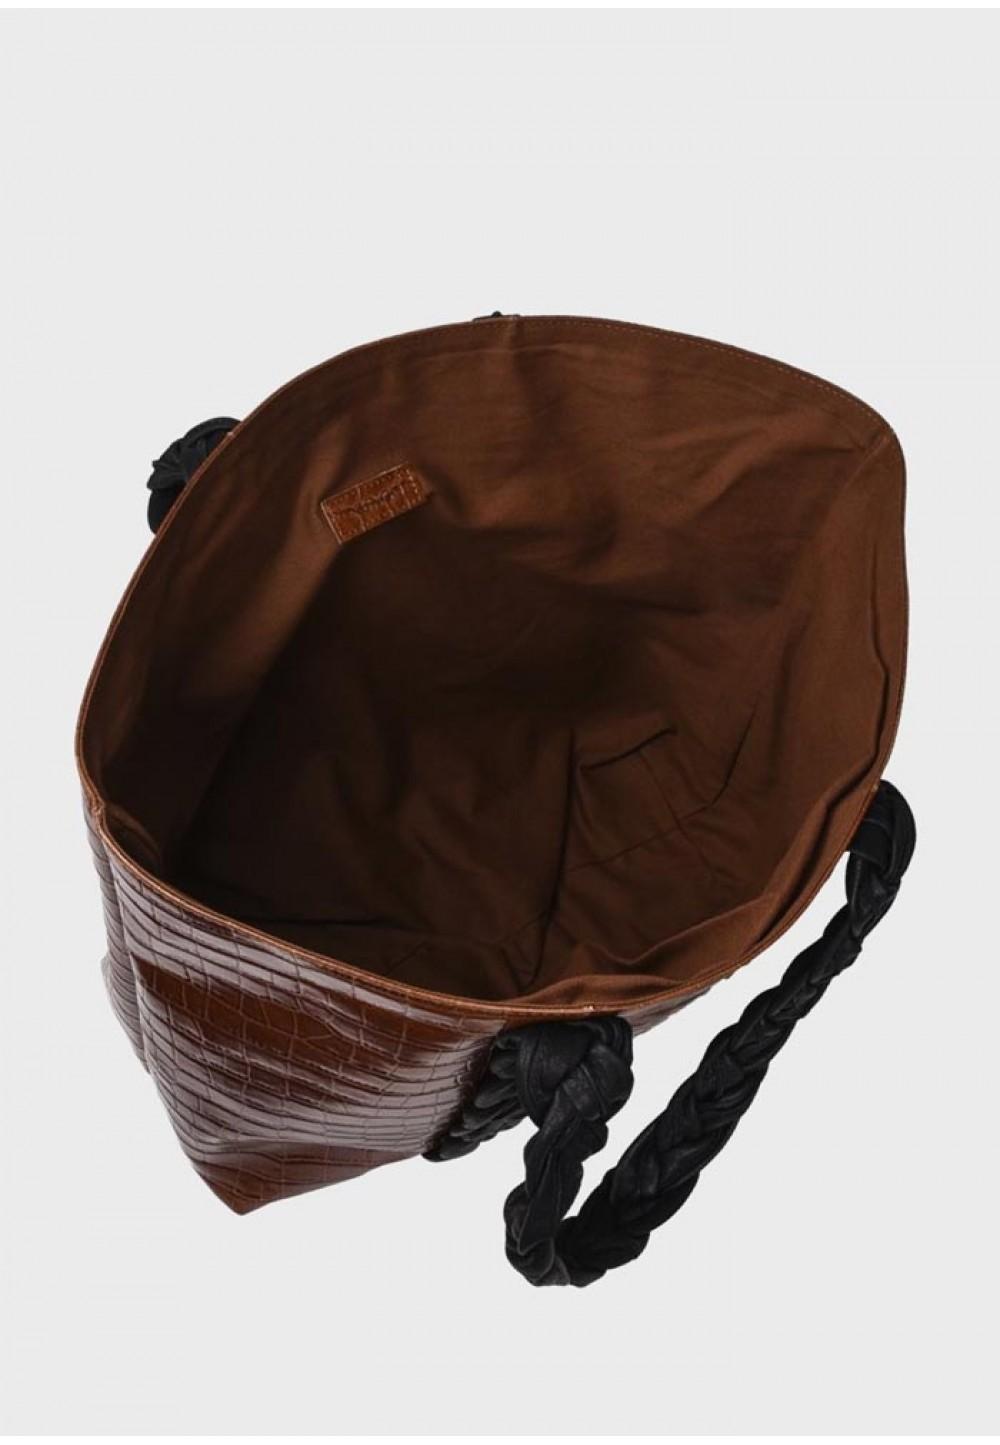 Коричневый кожаный шоппер Shopper croco